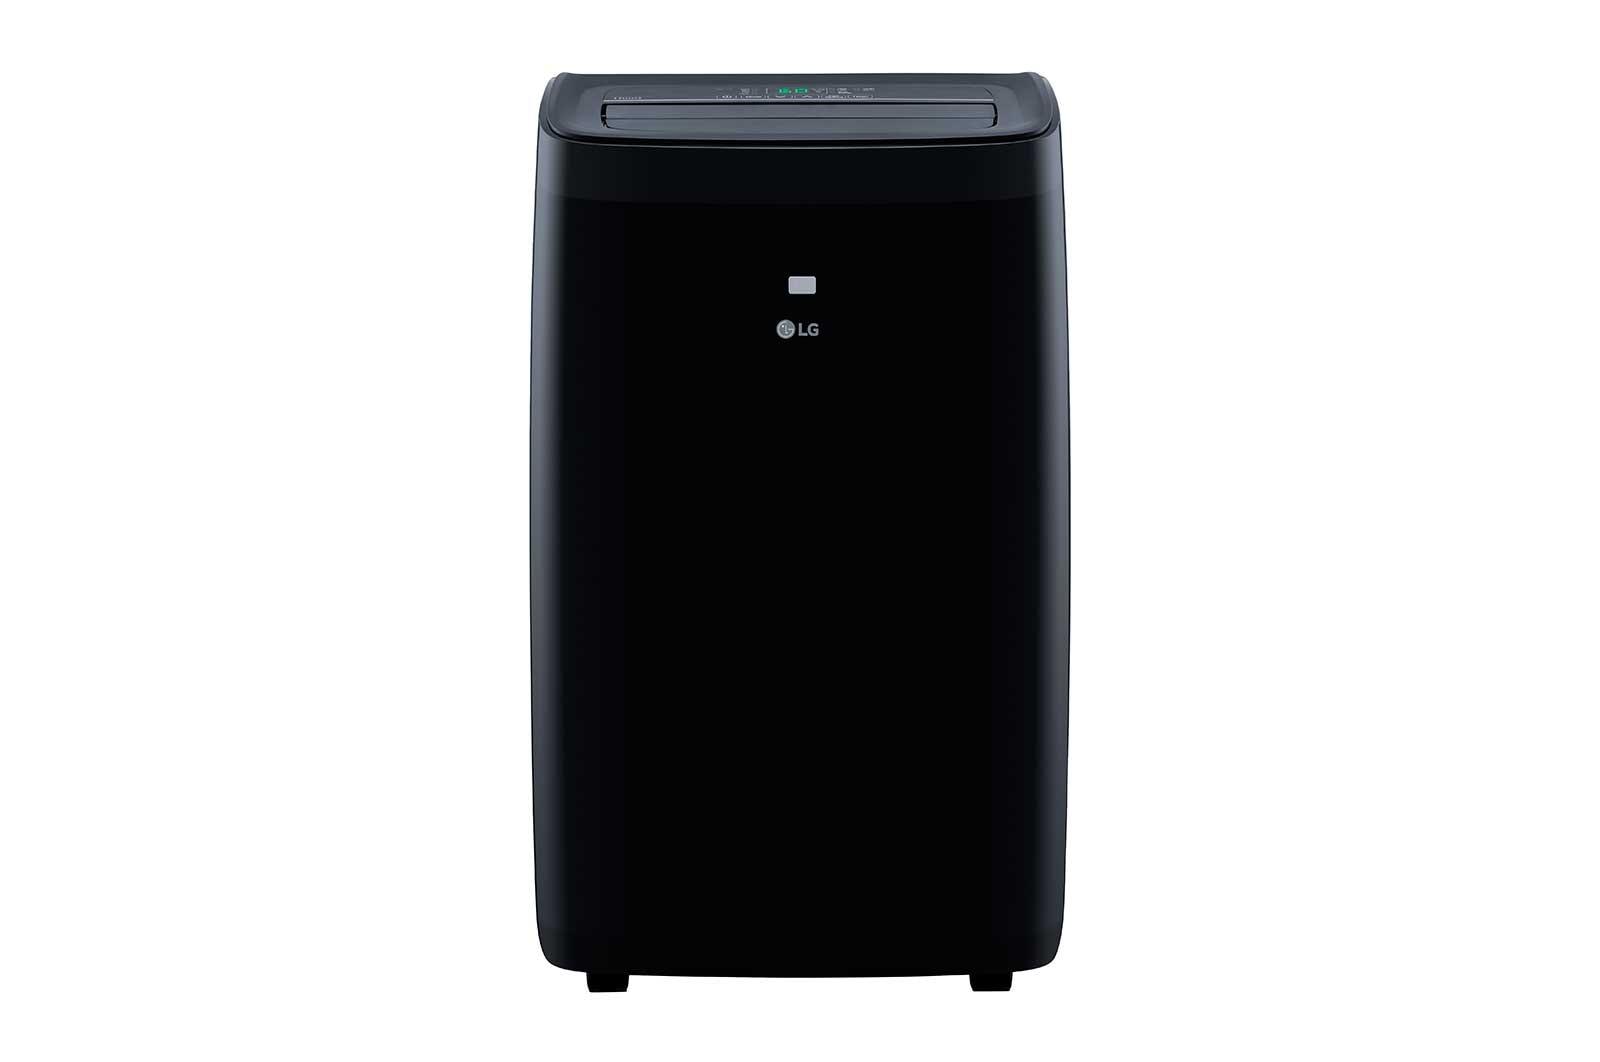 LG LP1021BHSM 10,000 BTU Smart Wi-Fi Portable Air Conditioner with Heat, Black